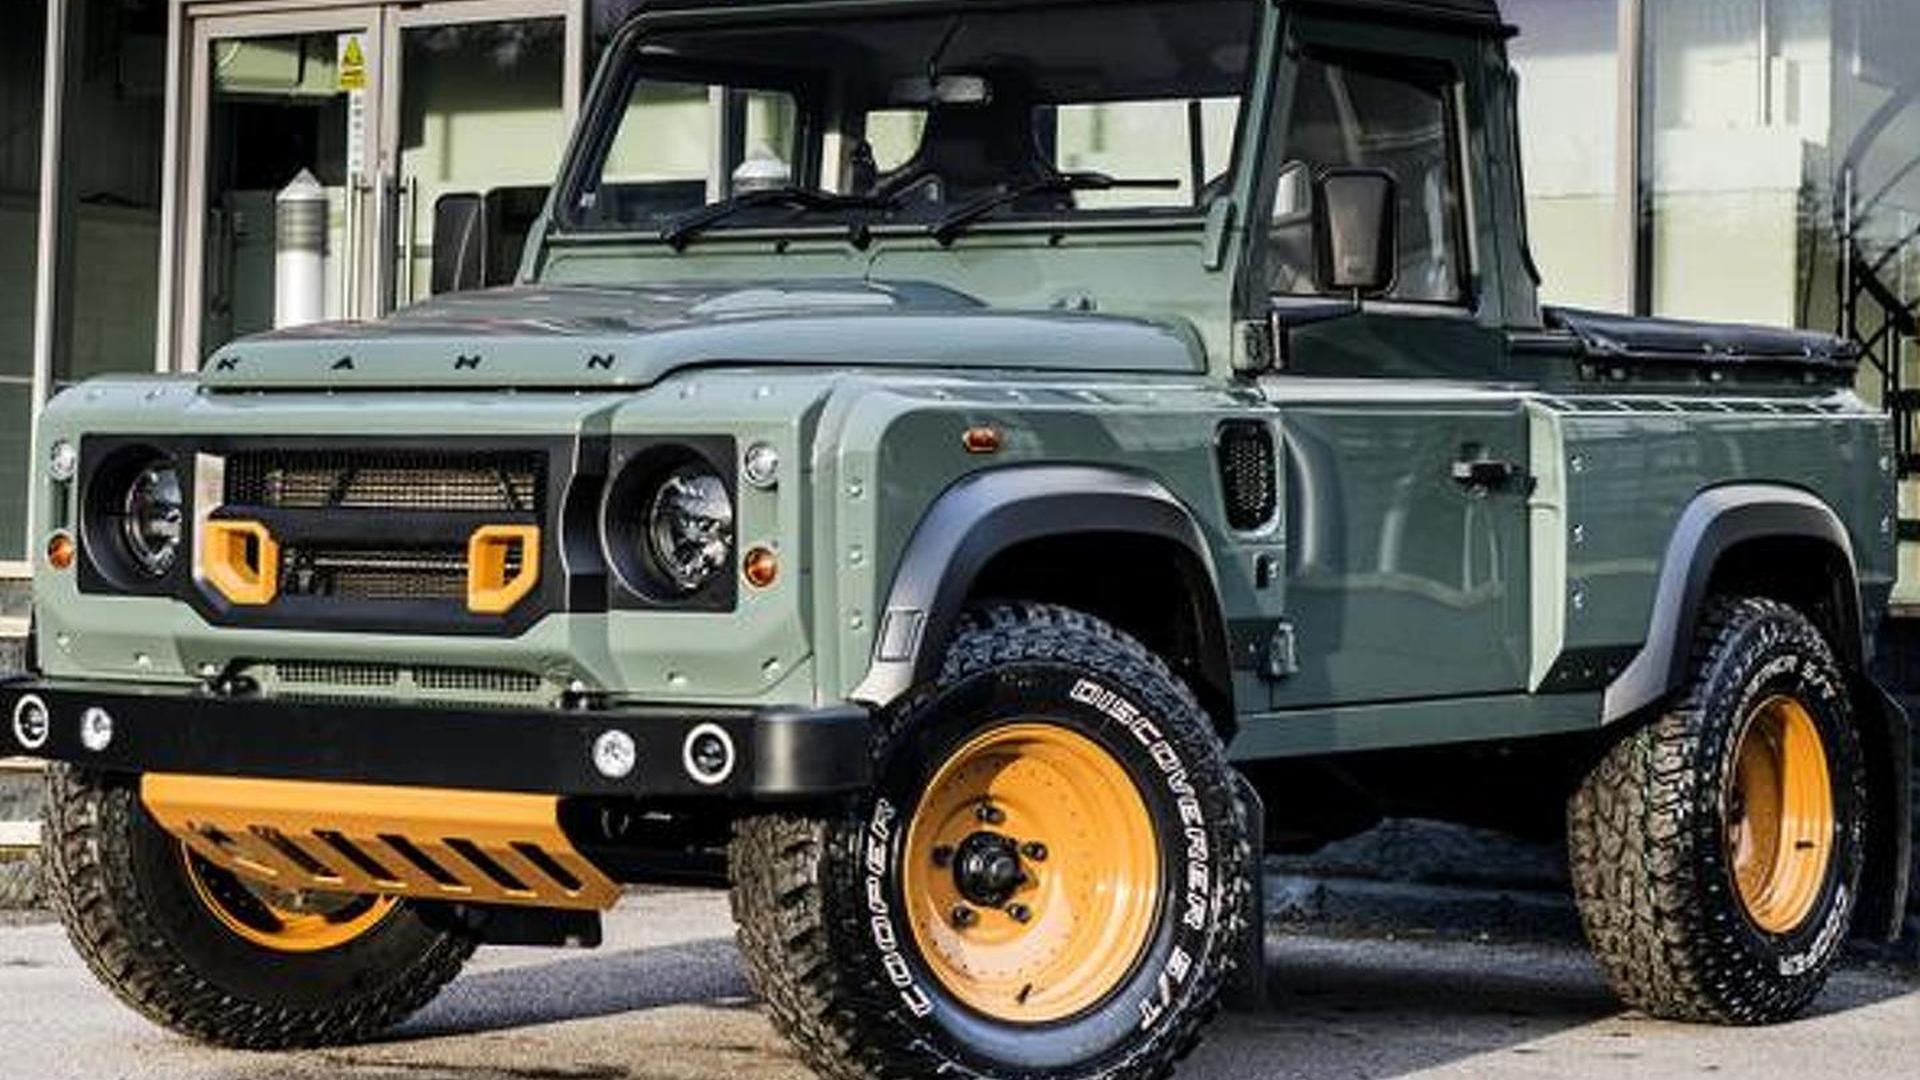 Kahn Design customizes the Land Rover Defender Pick Up